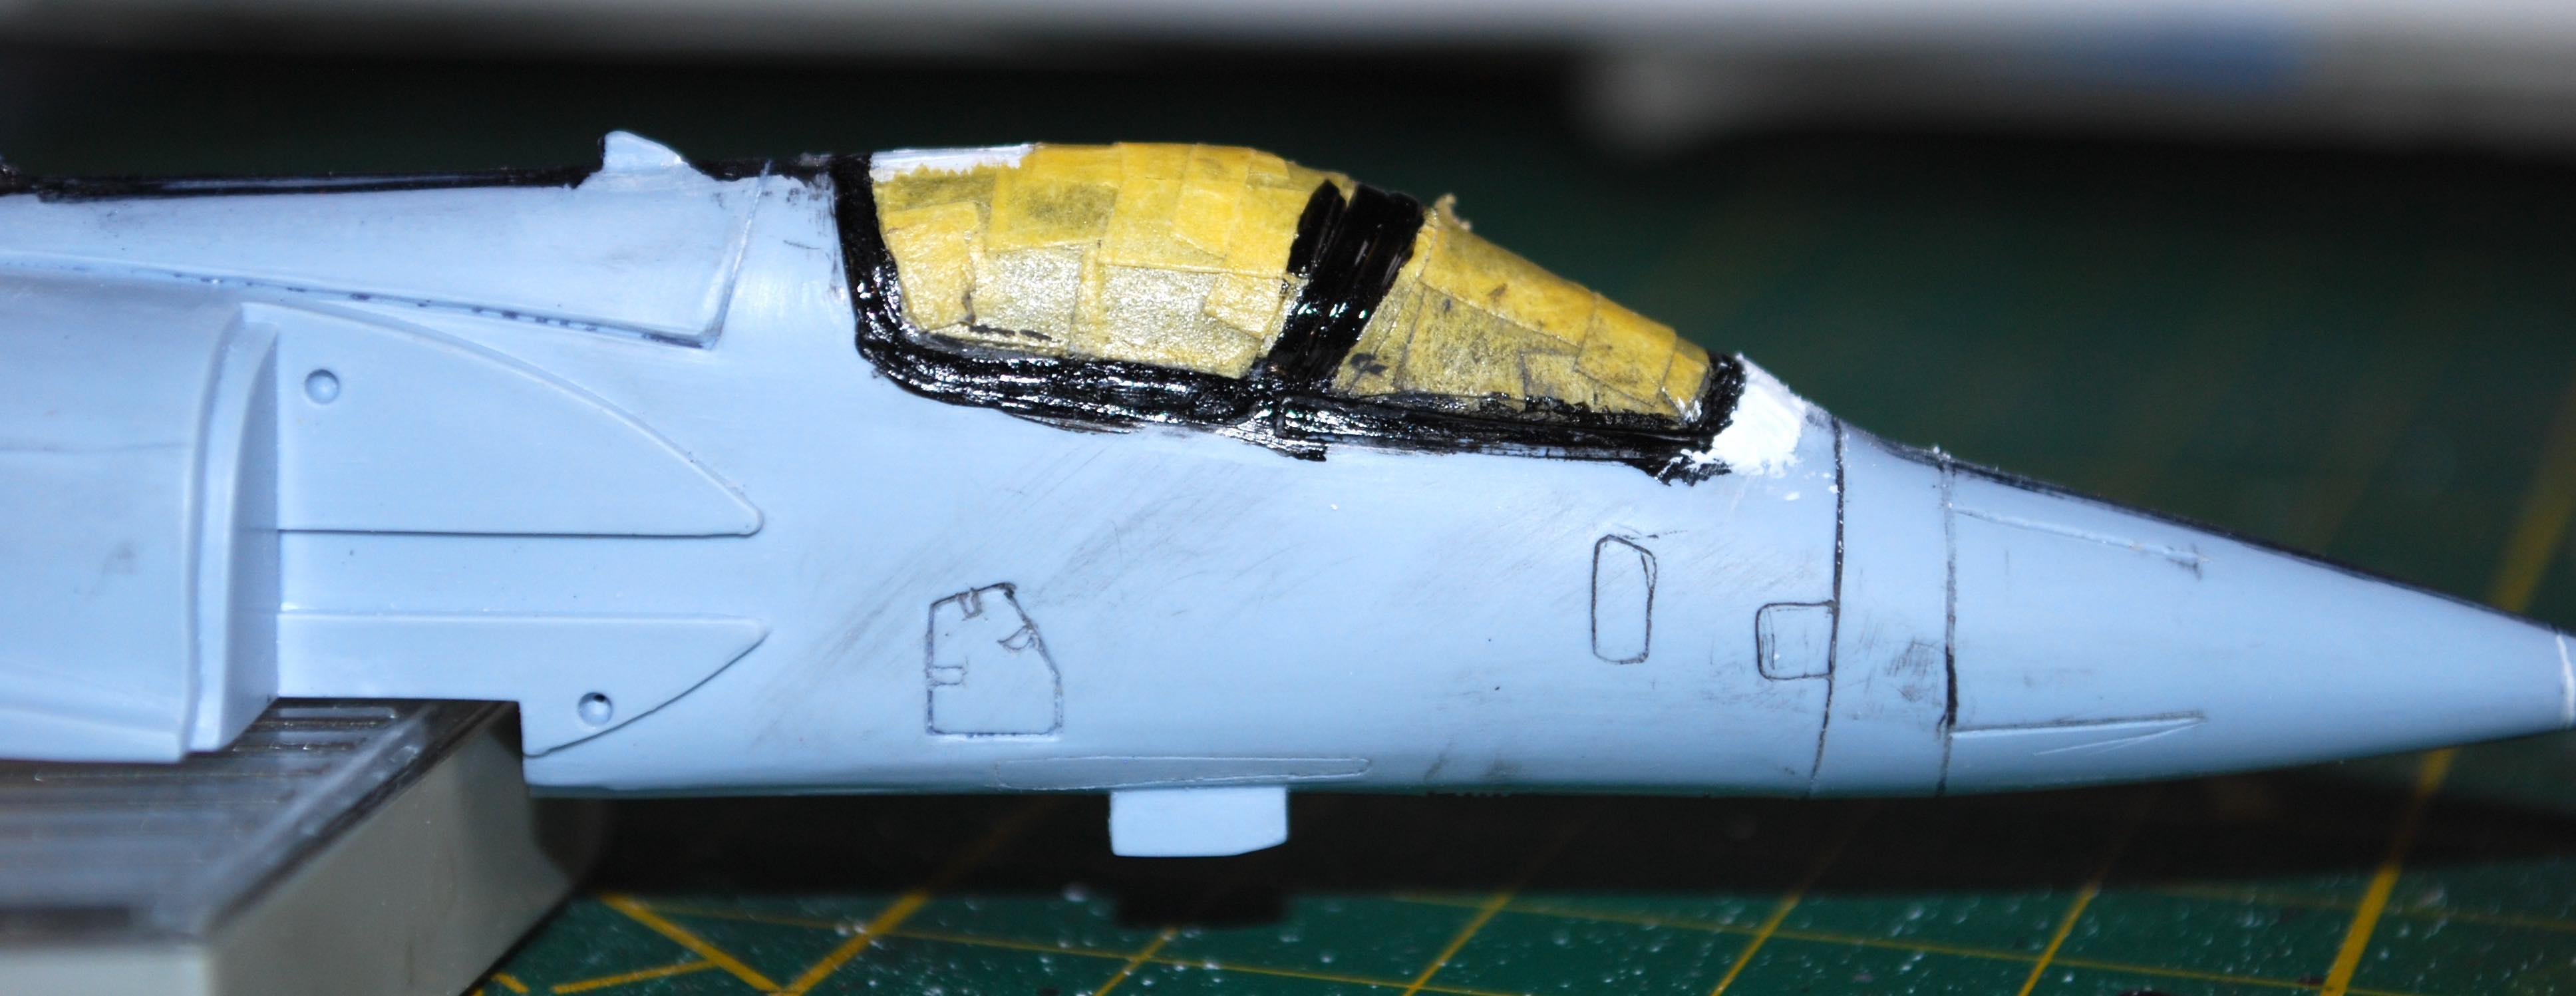 1/72 Mirage 2000-5F (Base 2000C) Heller Dsc_0292